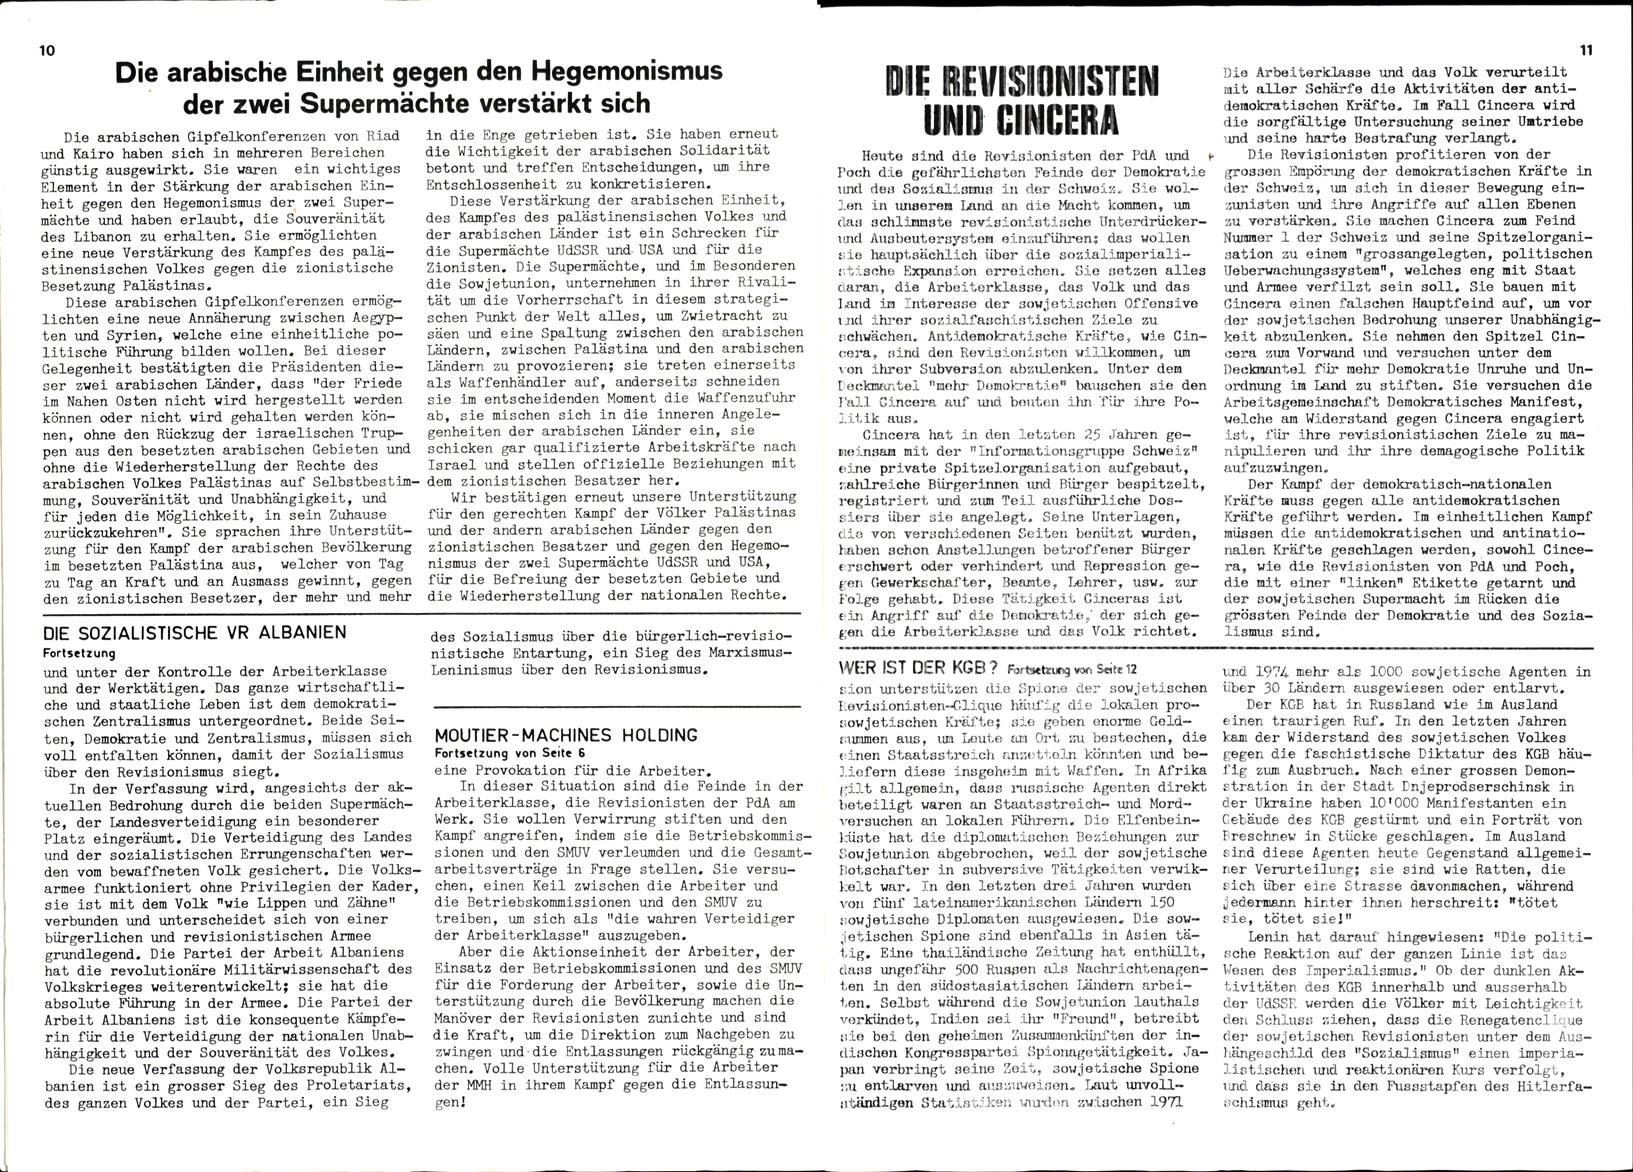 Schweiz_KPSML_Oktober_19770300_108_006